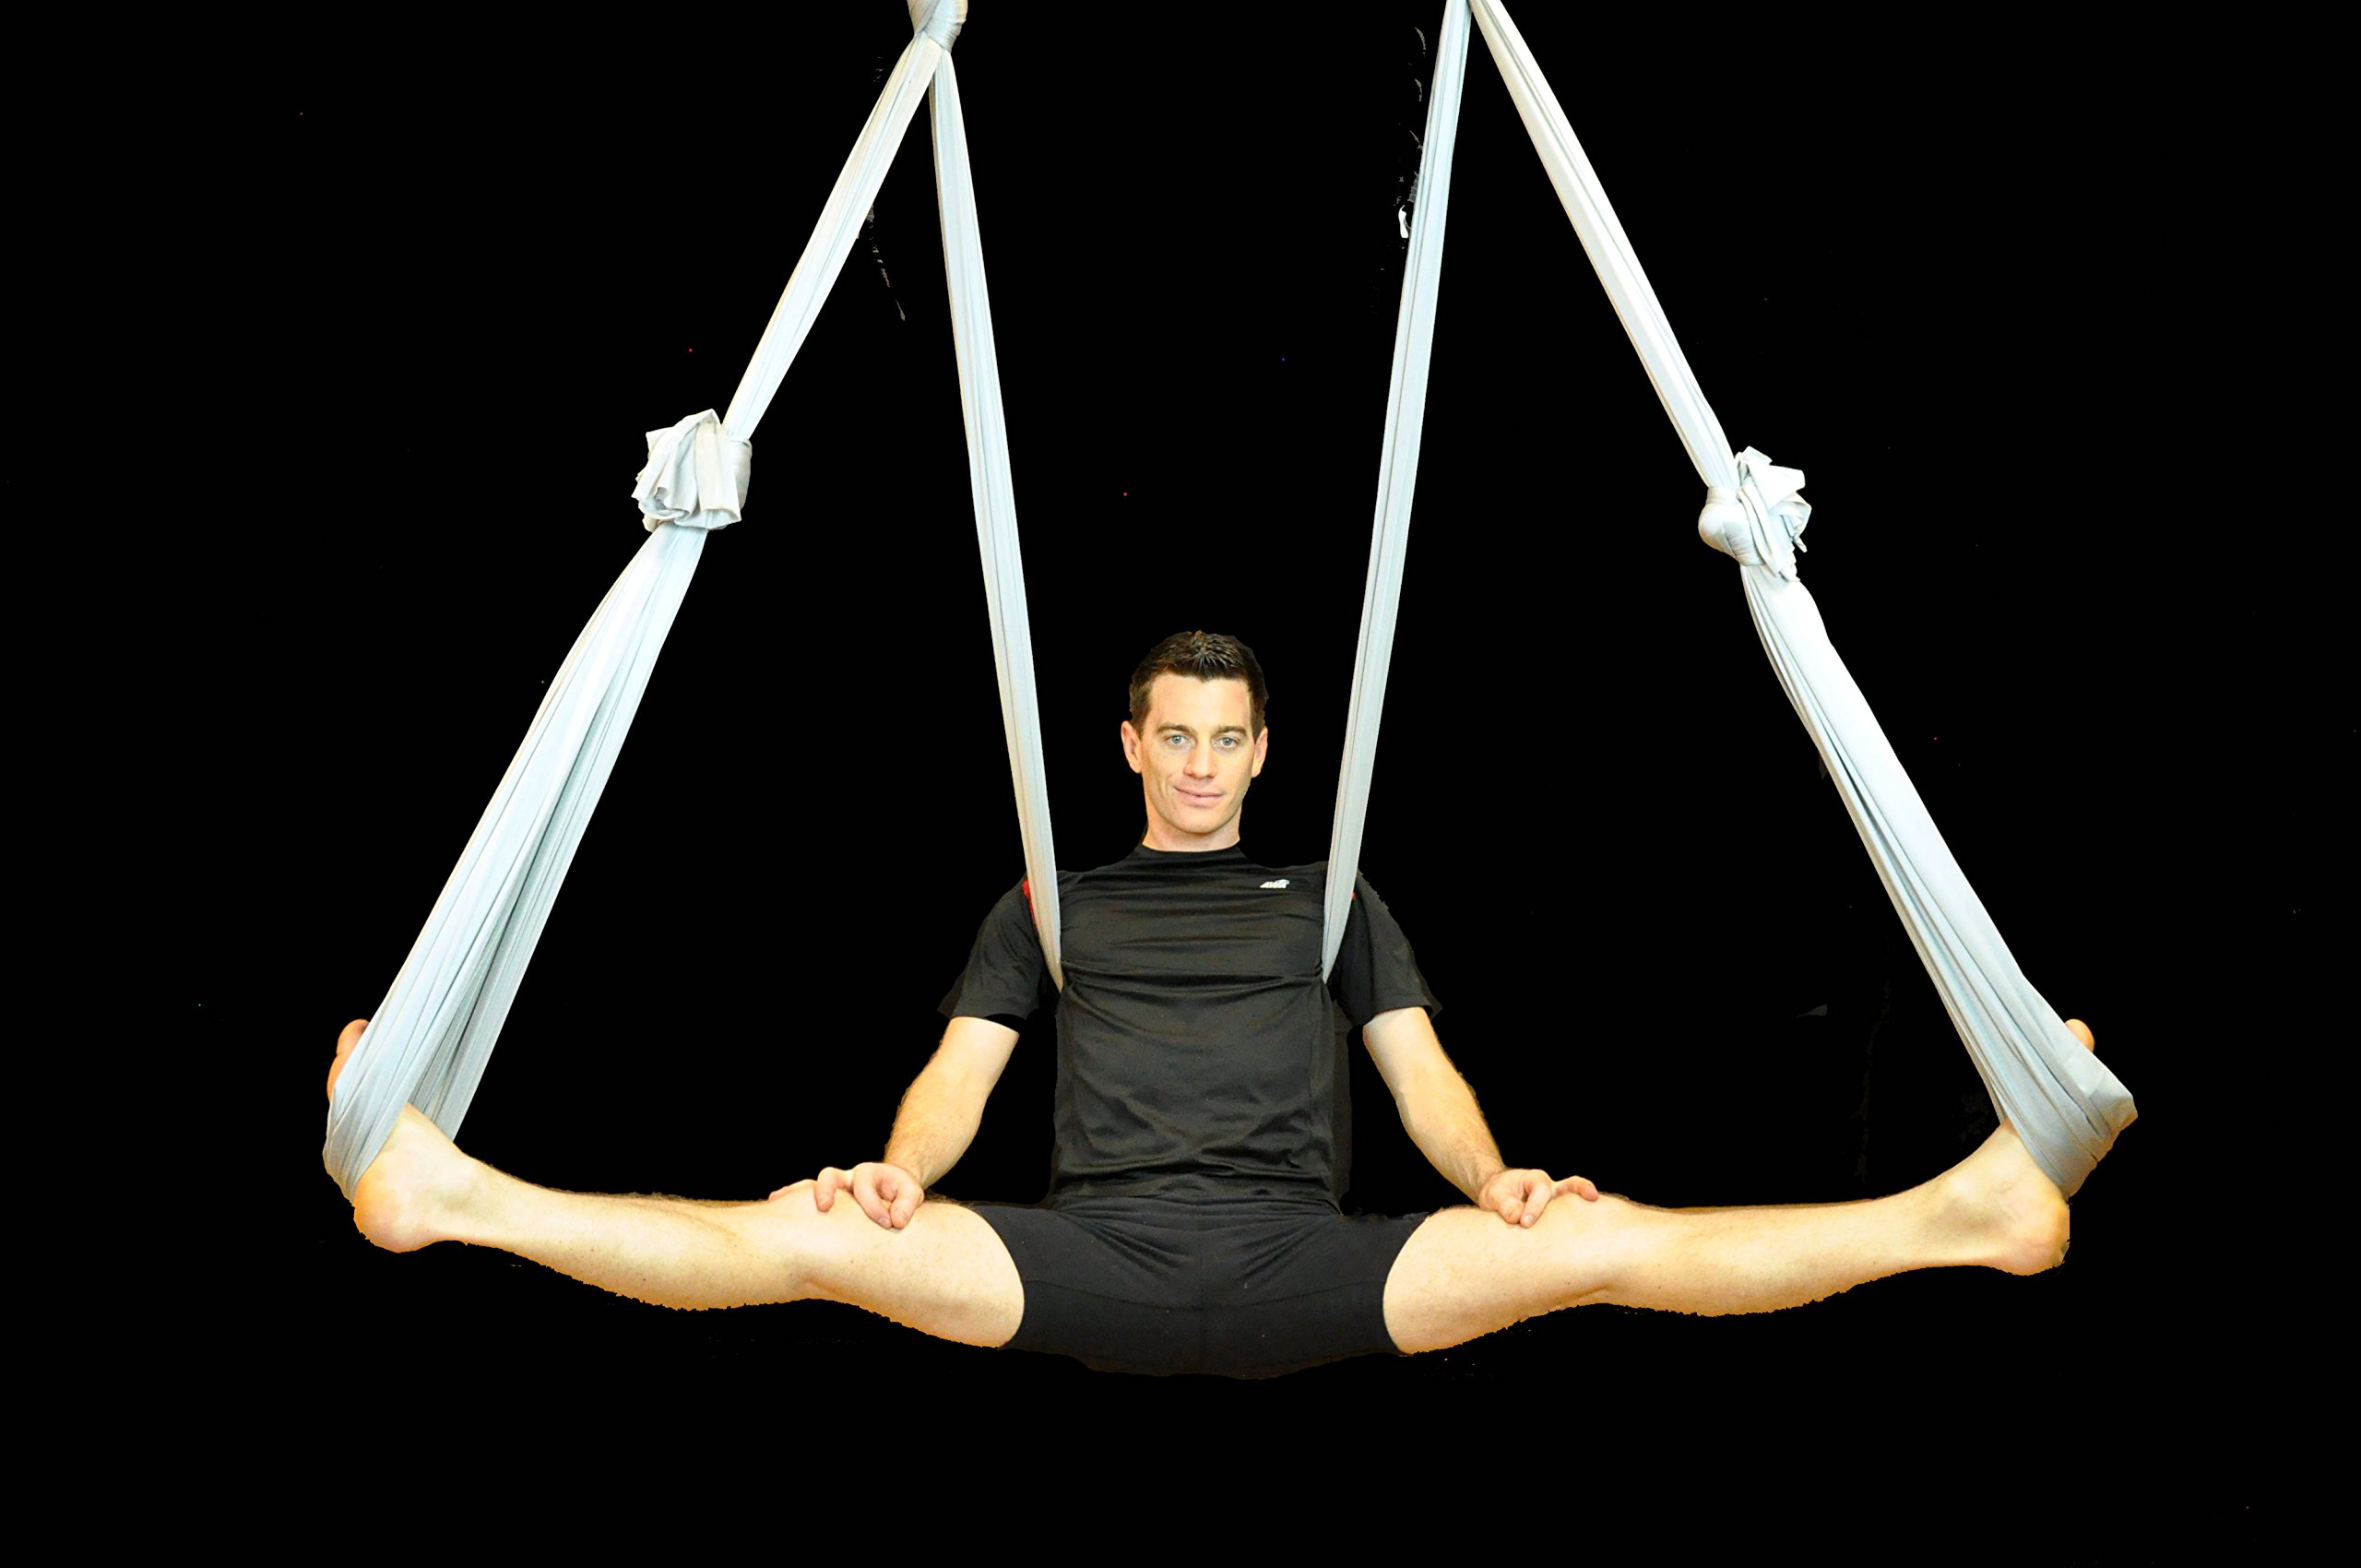 Deluxe Aerial Yoga Hammock (Yoga Swing or Sling Aerial Yoga) (Silver Streak)